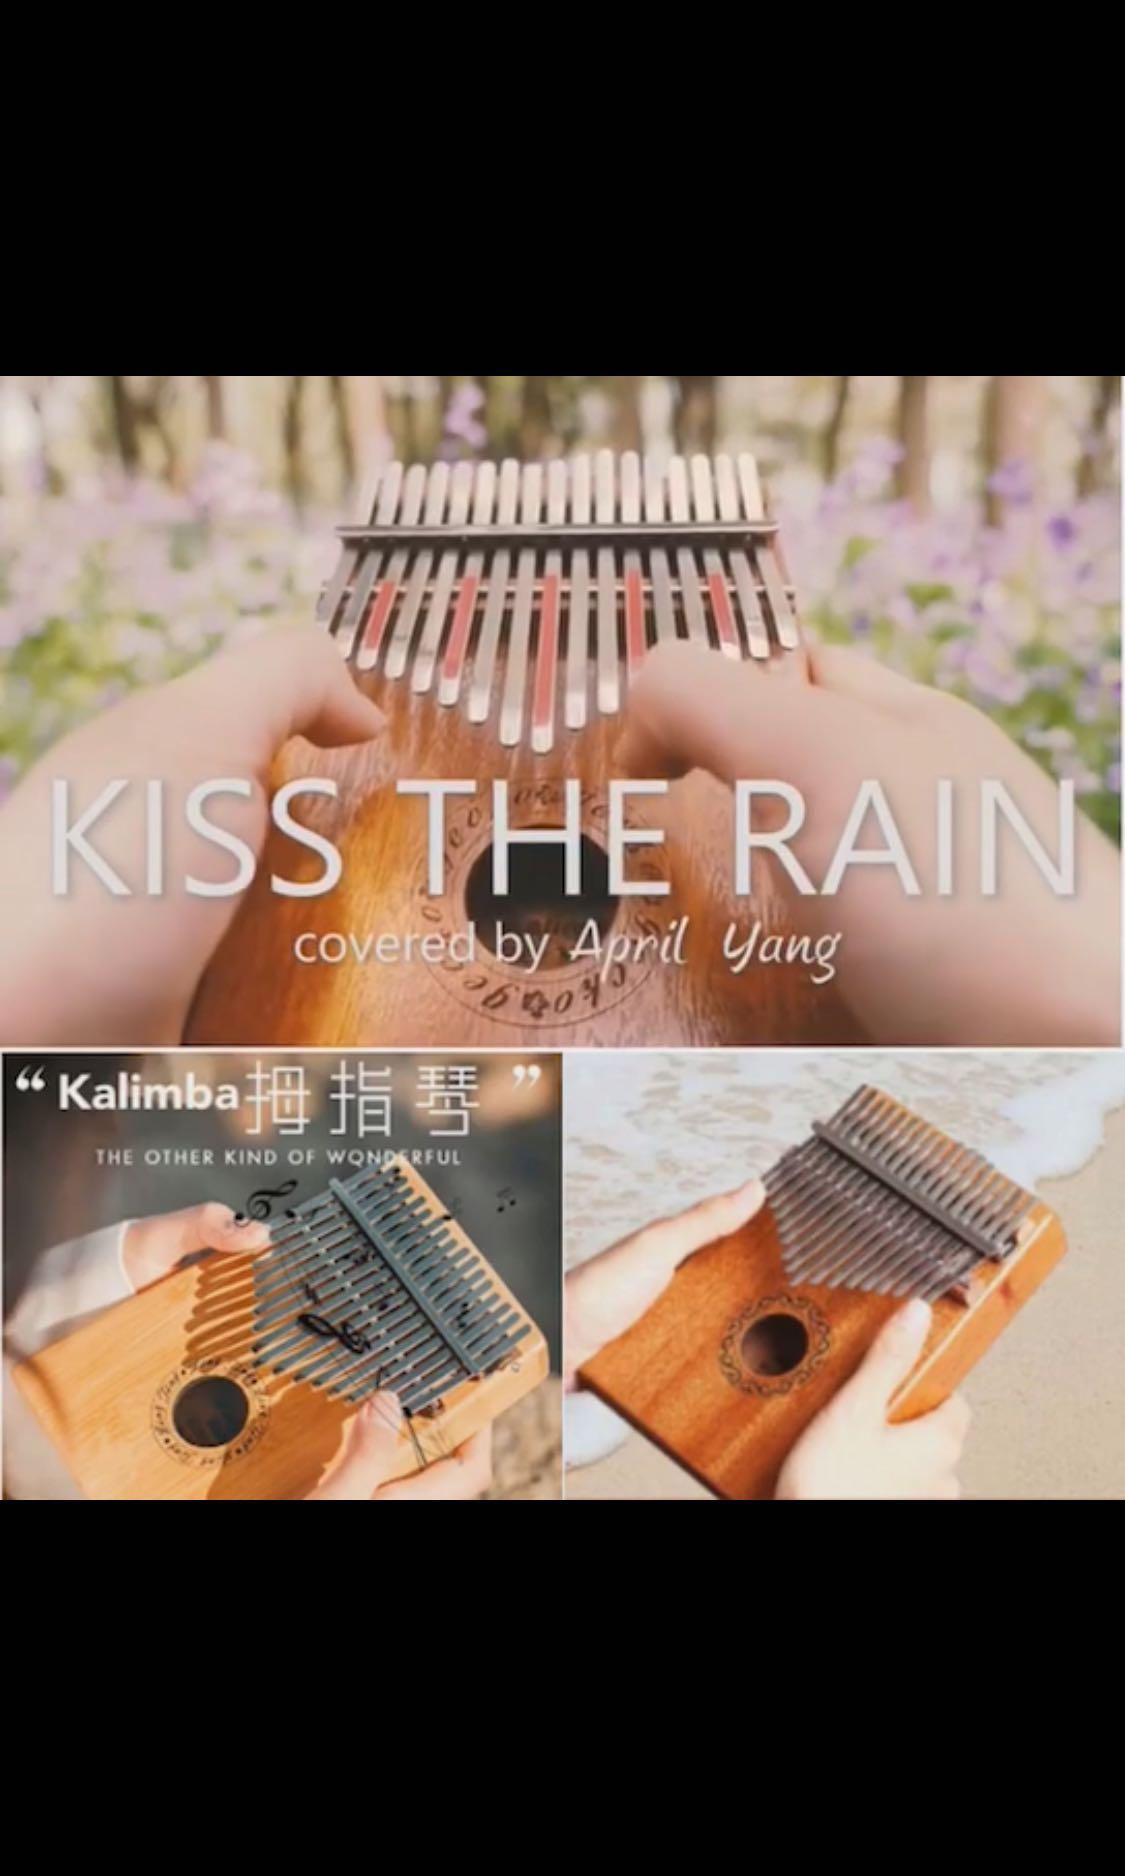 Kalimba 卡林巴拇指琴